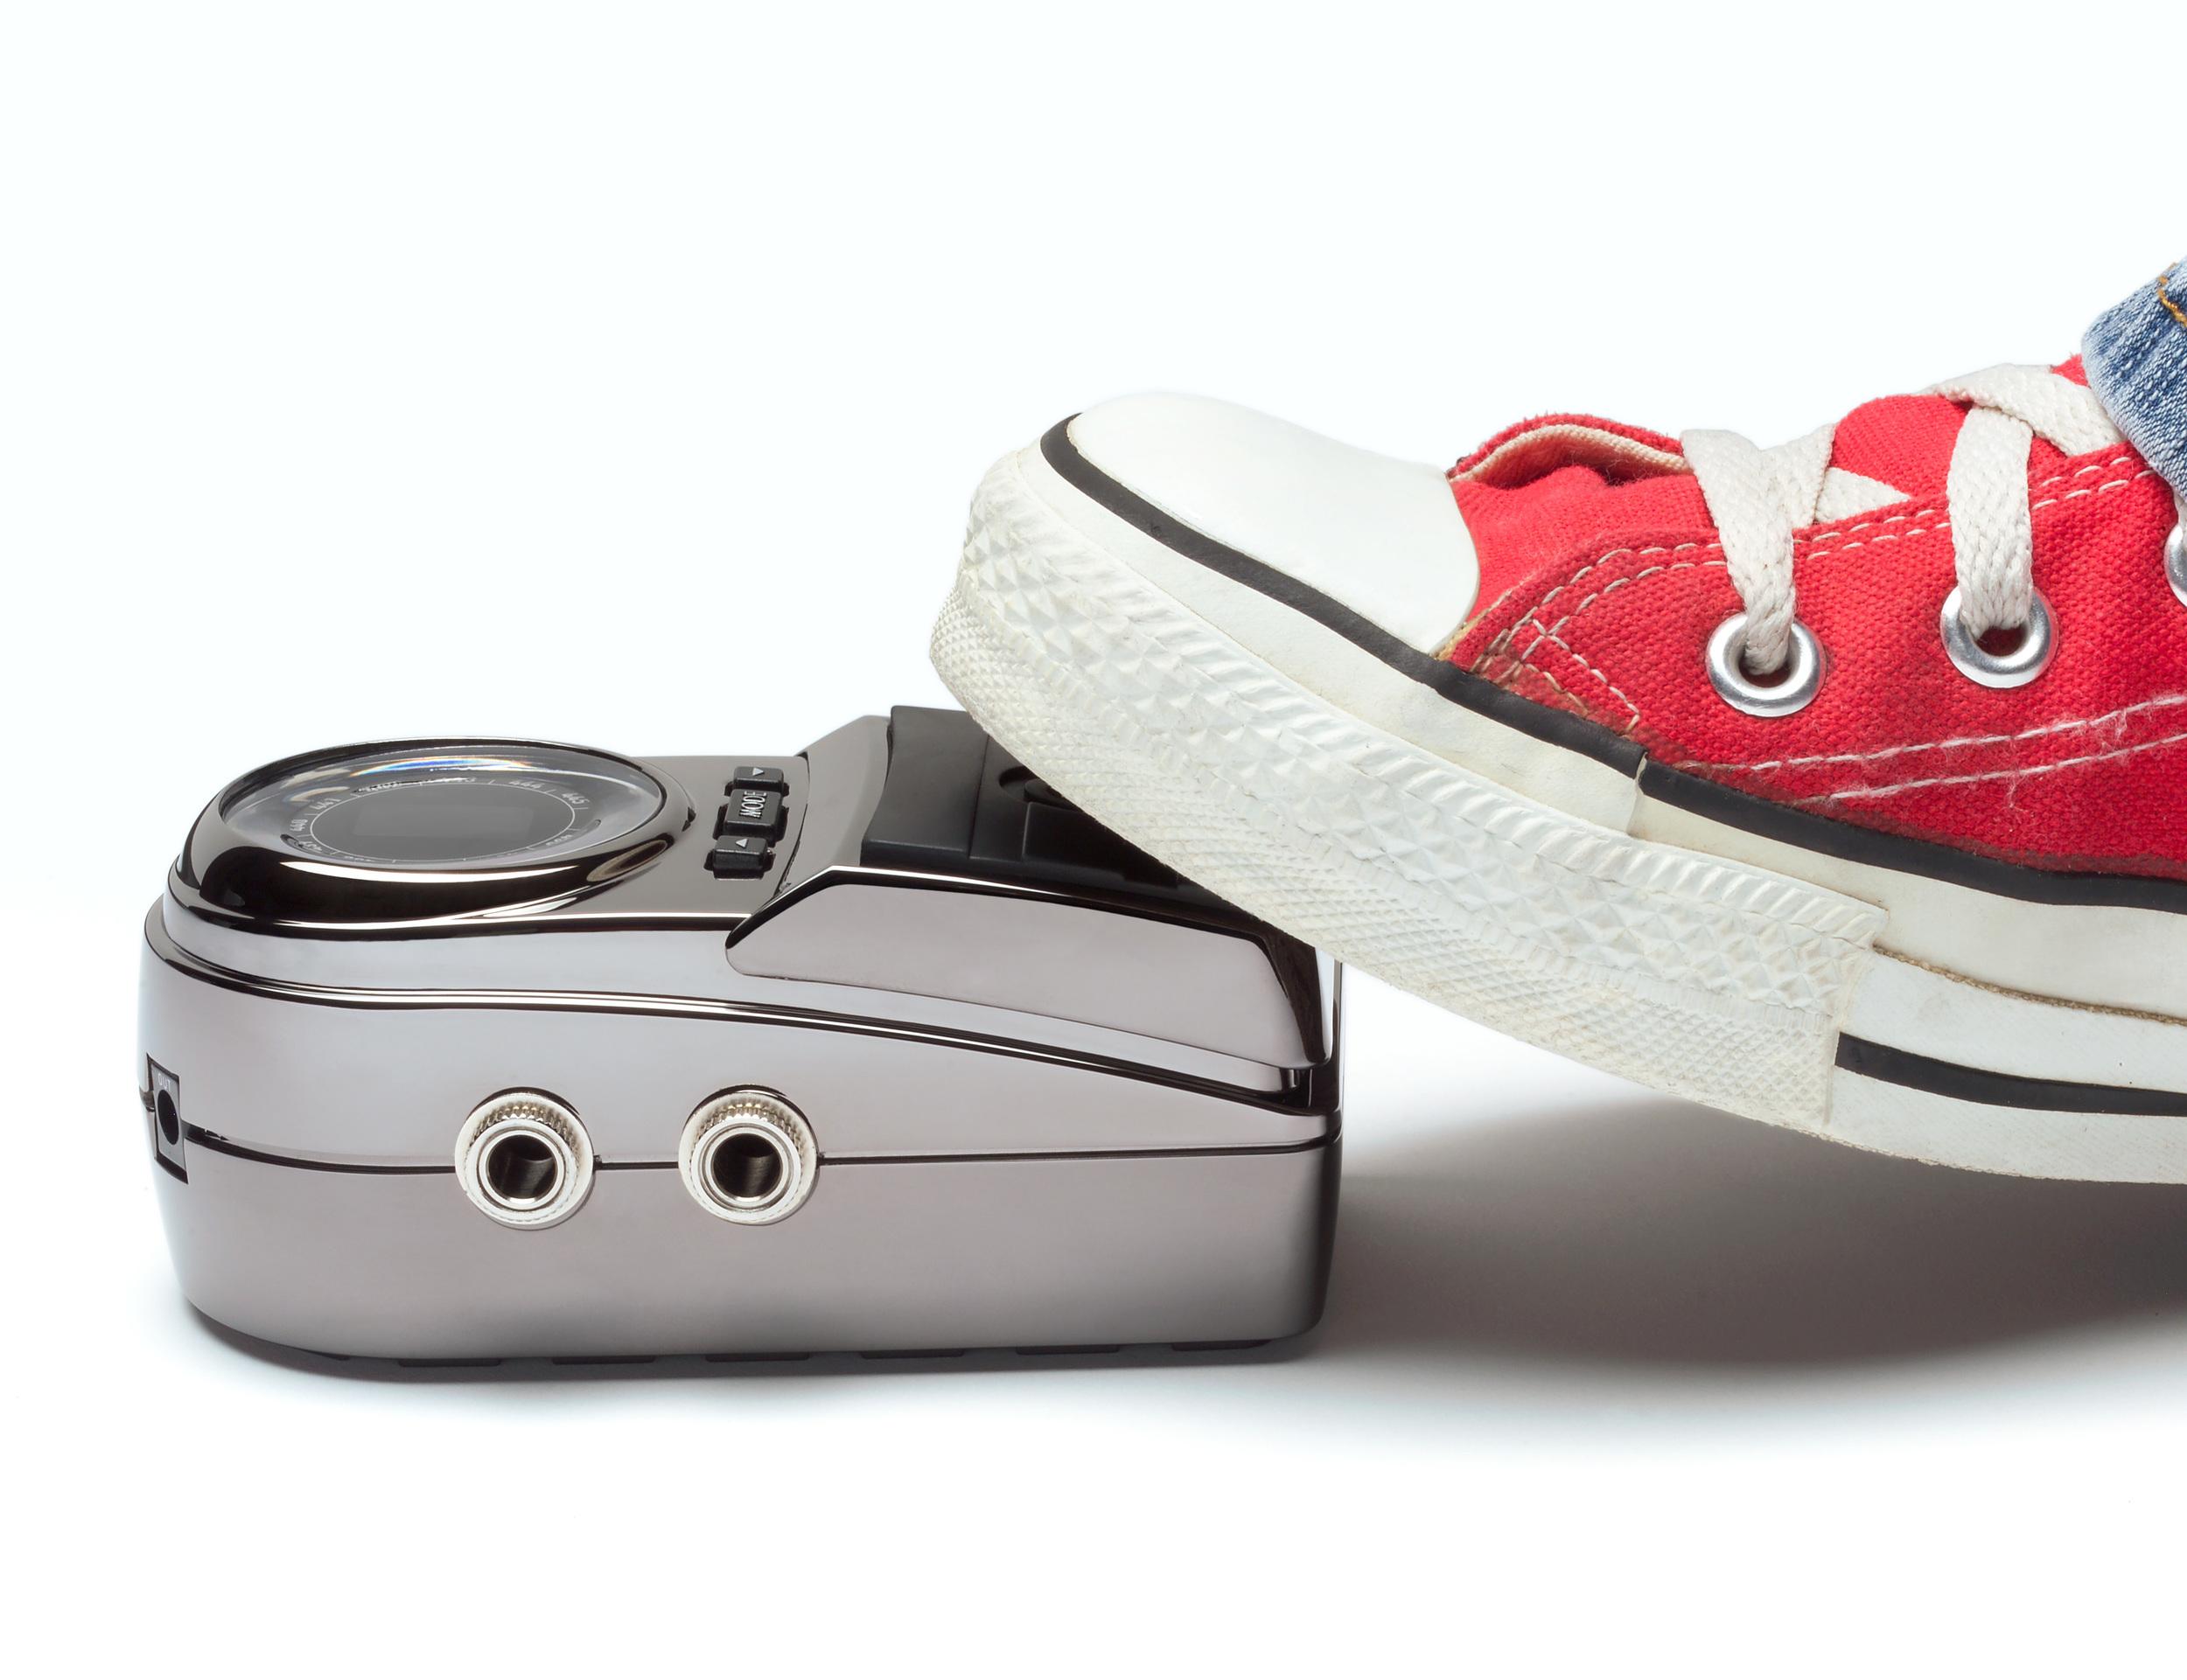 P_SF02_stomp_sv_w-shoe-red.jpg